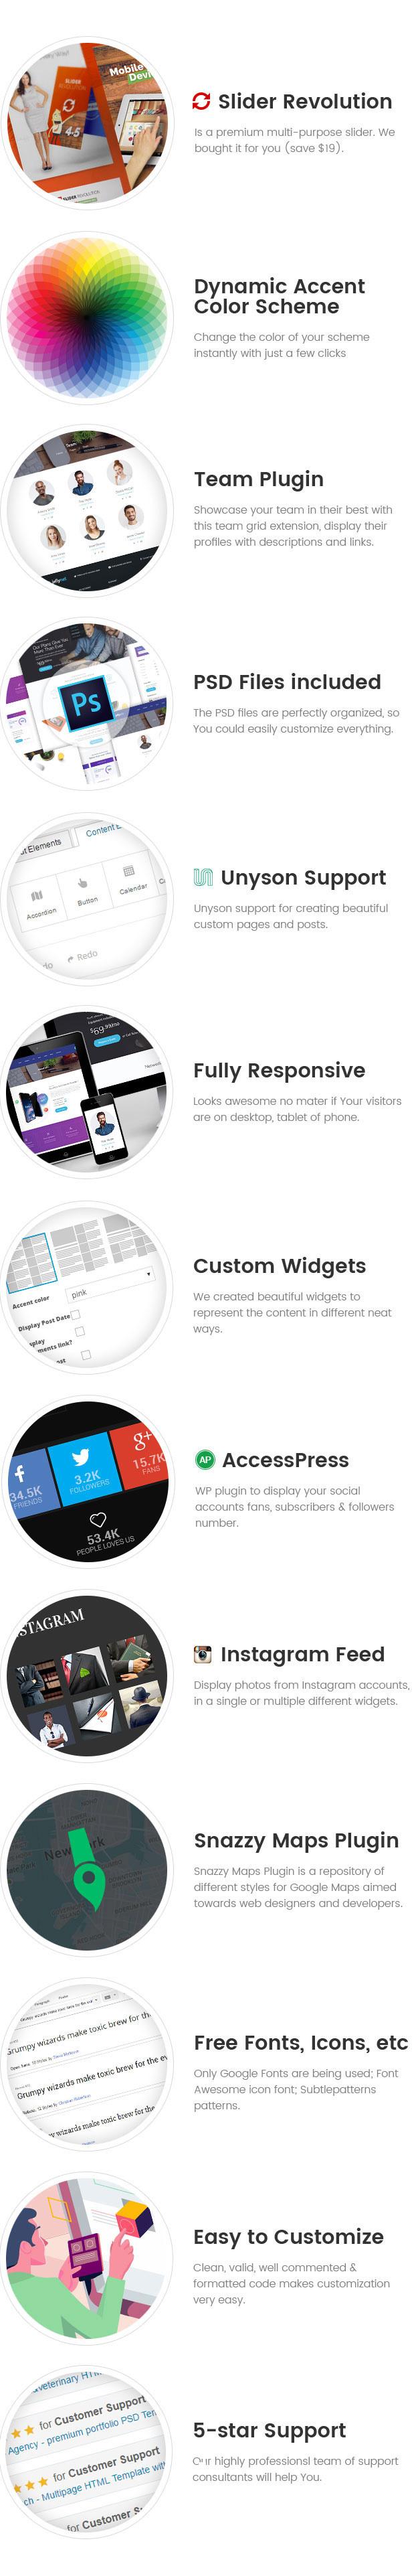 JelyCo - ISP & Telecom WordPress Theme